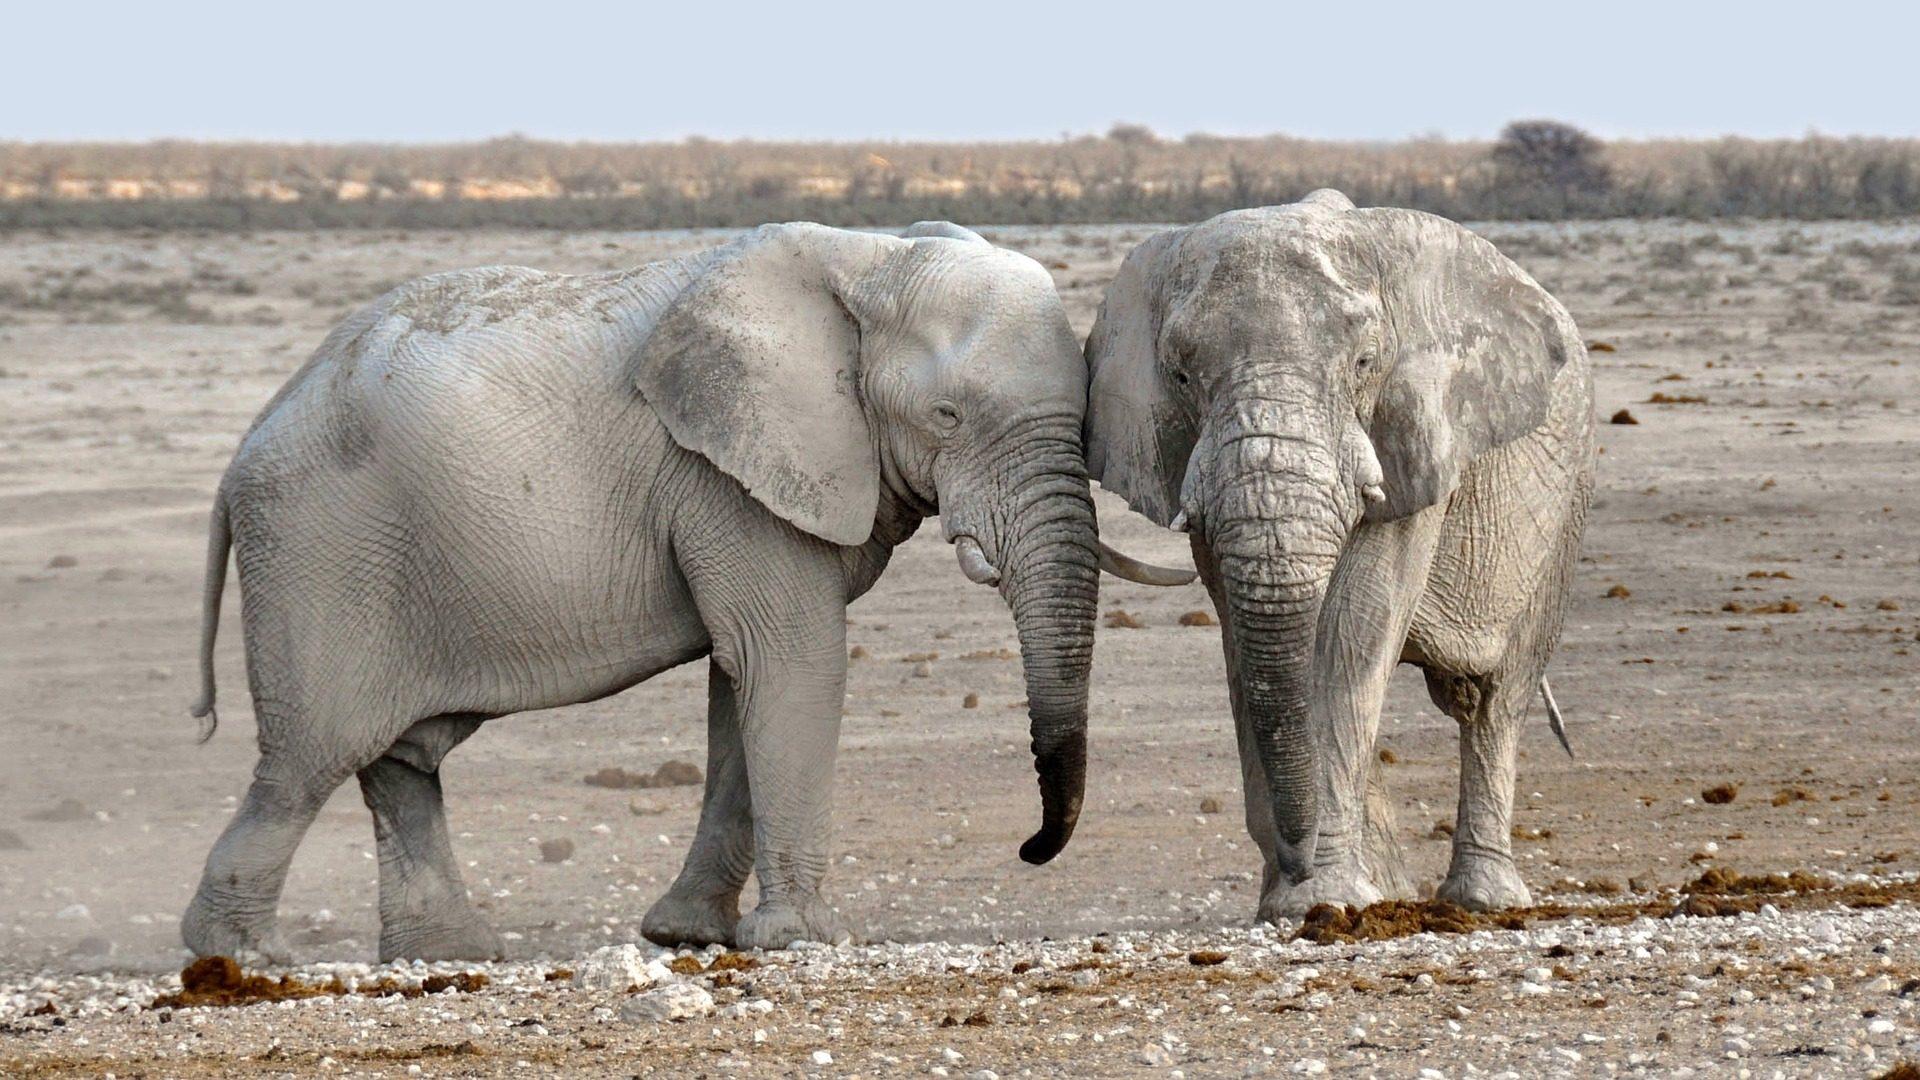 elefanti, coppia, compañeros, deserto, Namibia, Africa - Sfondi HD - Professor-falken.com